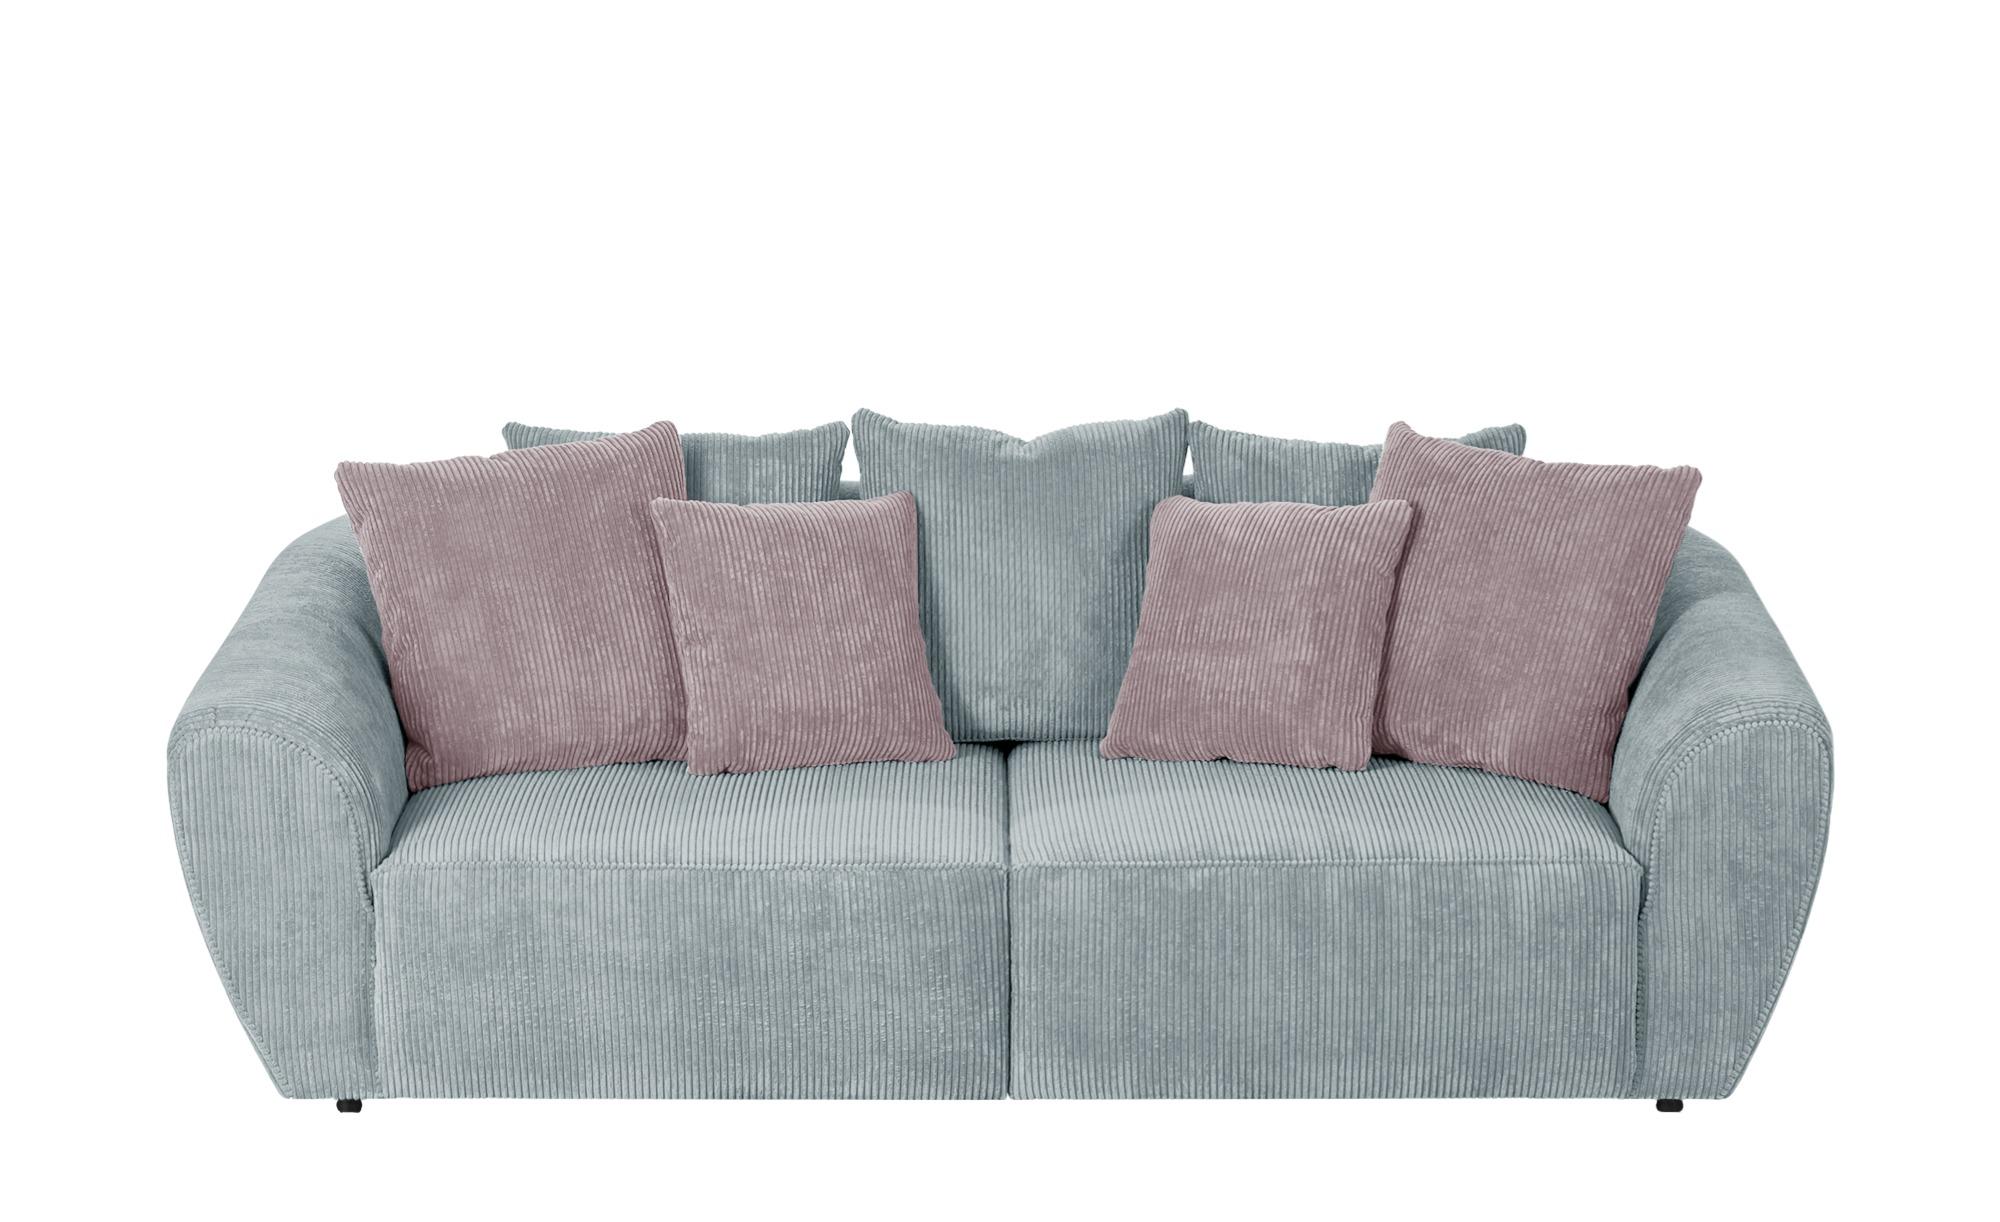 smart Big Sofa  Savita ¦ grün ¦ Maße (cm): B: 255 H: 90 T: 113 Polstermöbel > Sofas > 3-Sitzer - Höffner